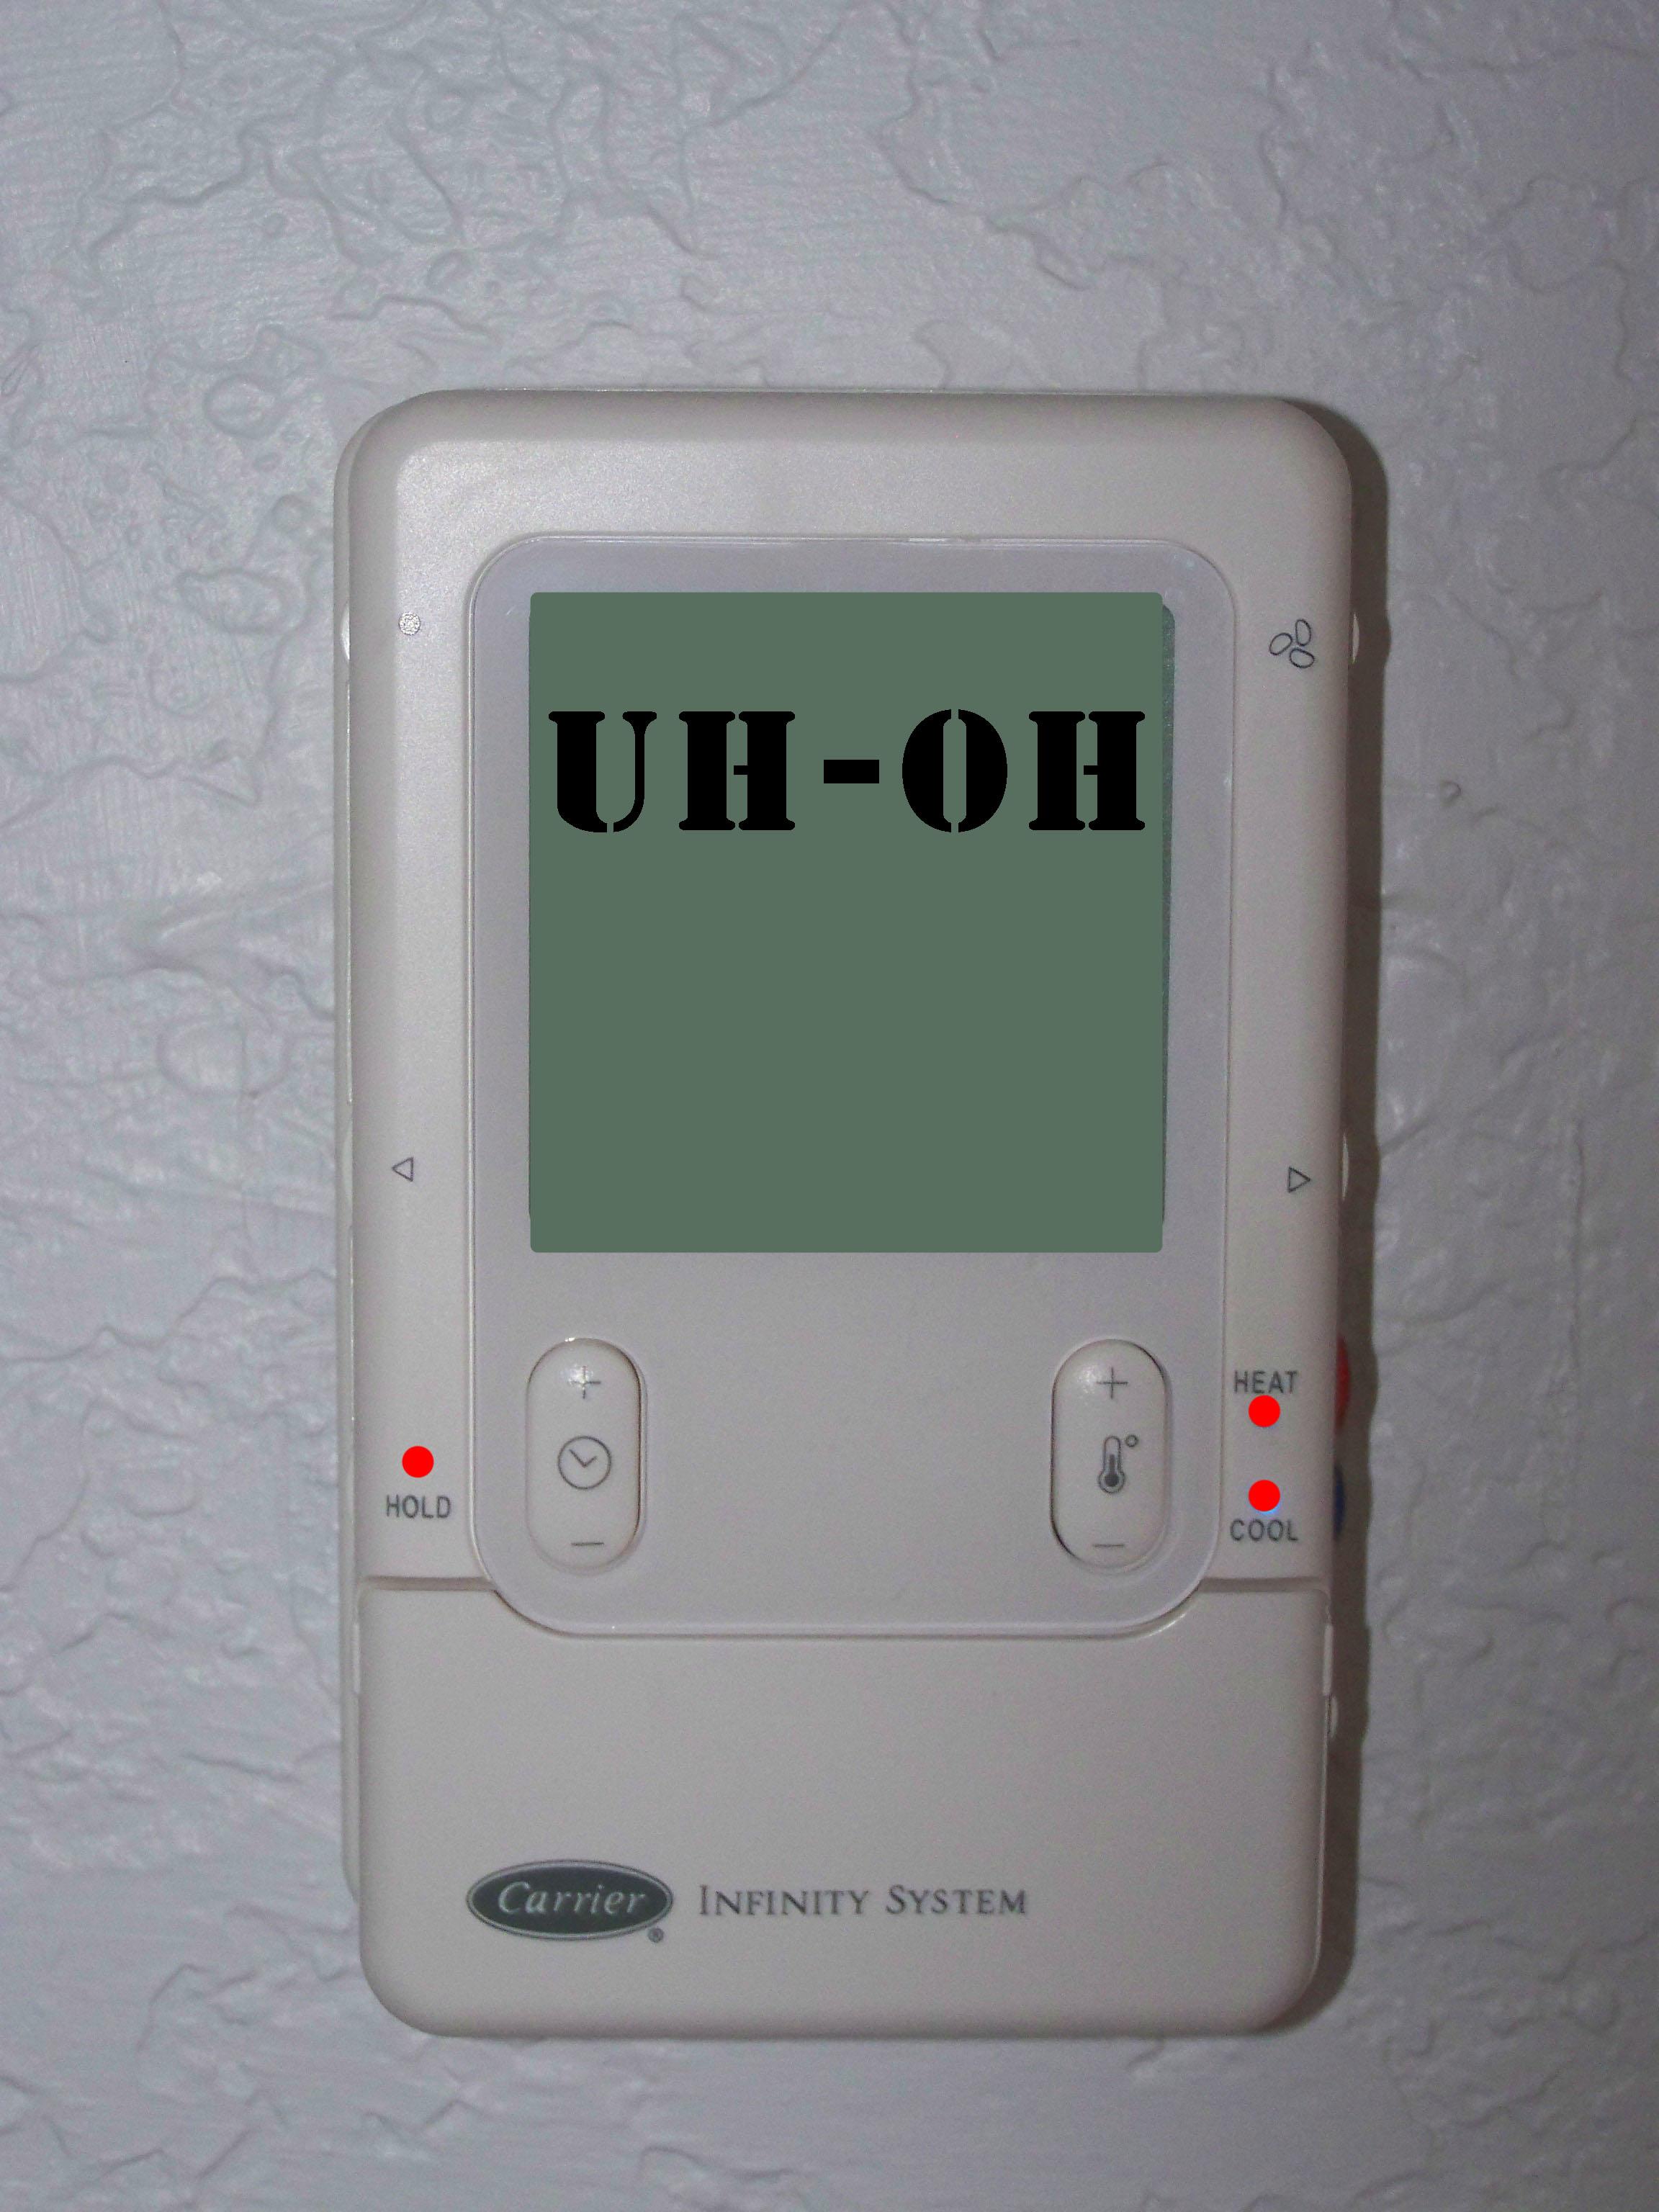 Großzügig Hunter Thermostat Schaltplan Fotos - Verdrahtungsideen ...